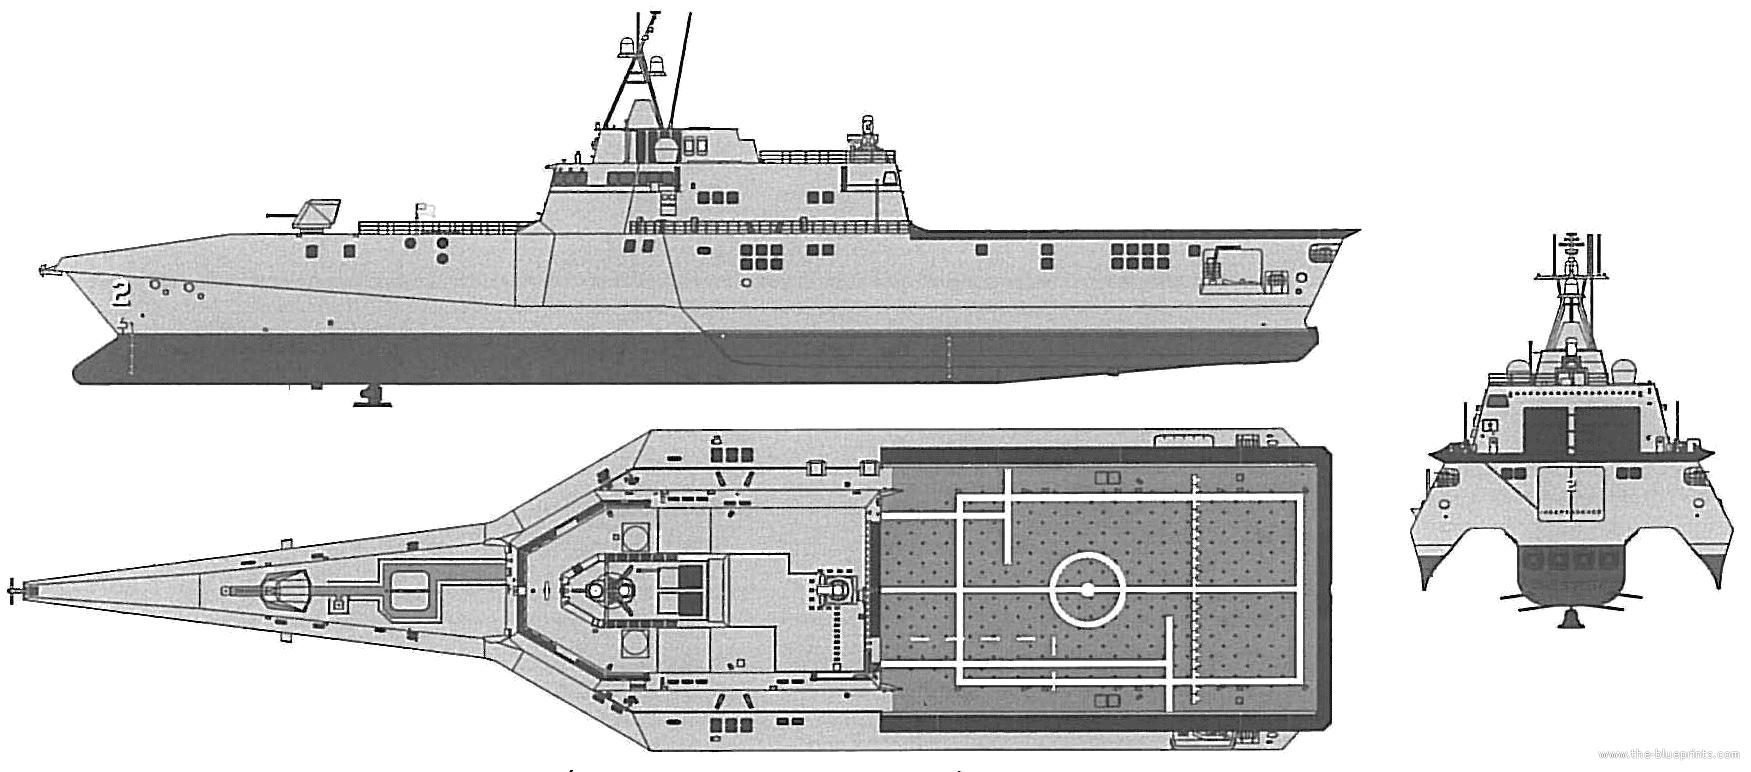 Modern+Warships+of+the+World | The World of Warships ... Modern Us Battleship Design